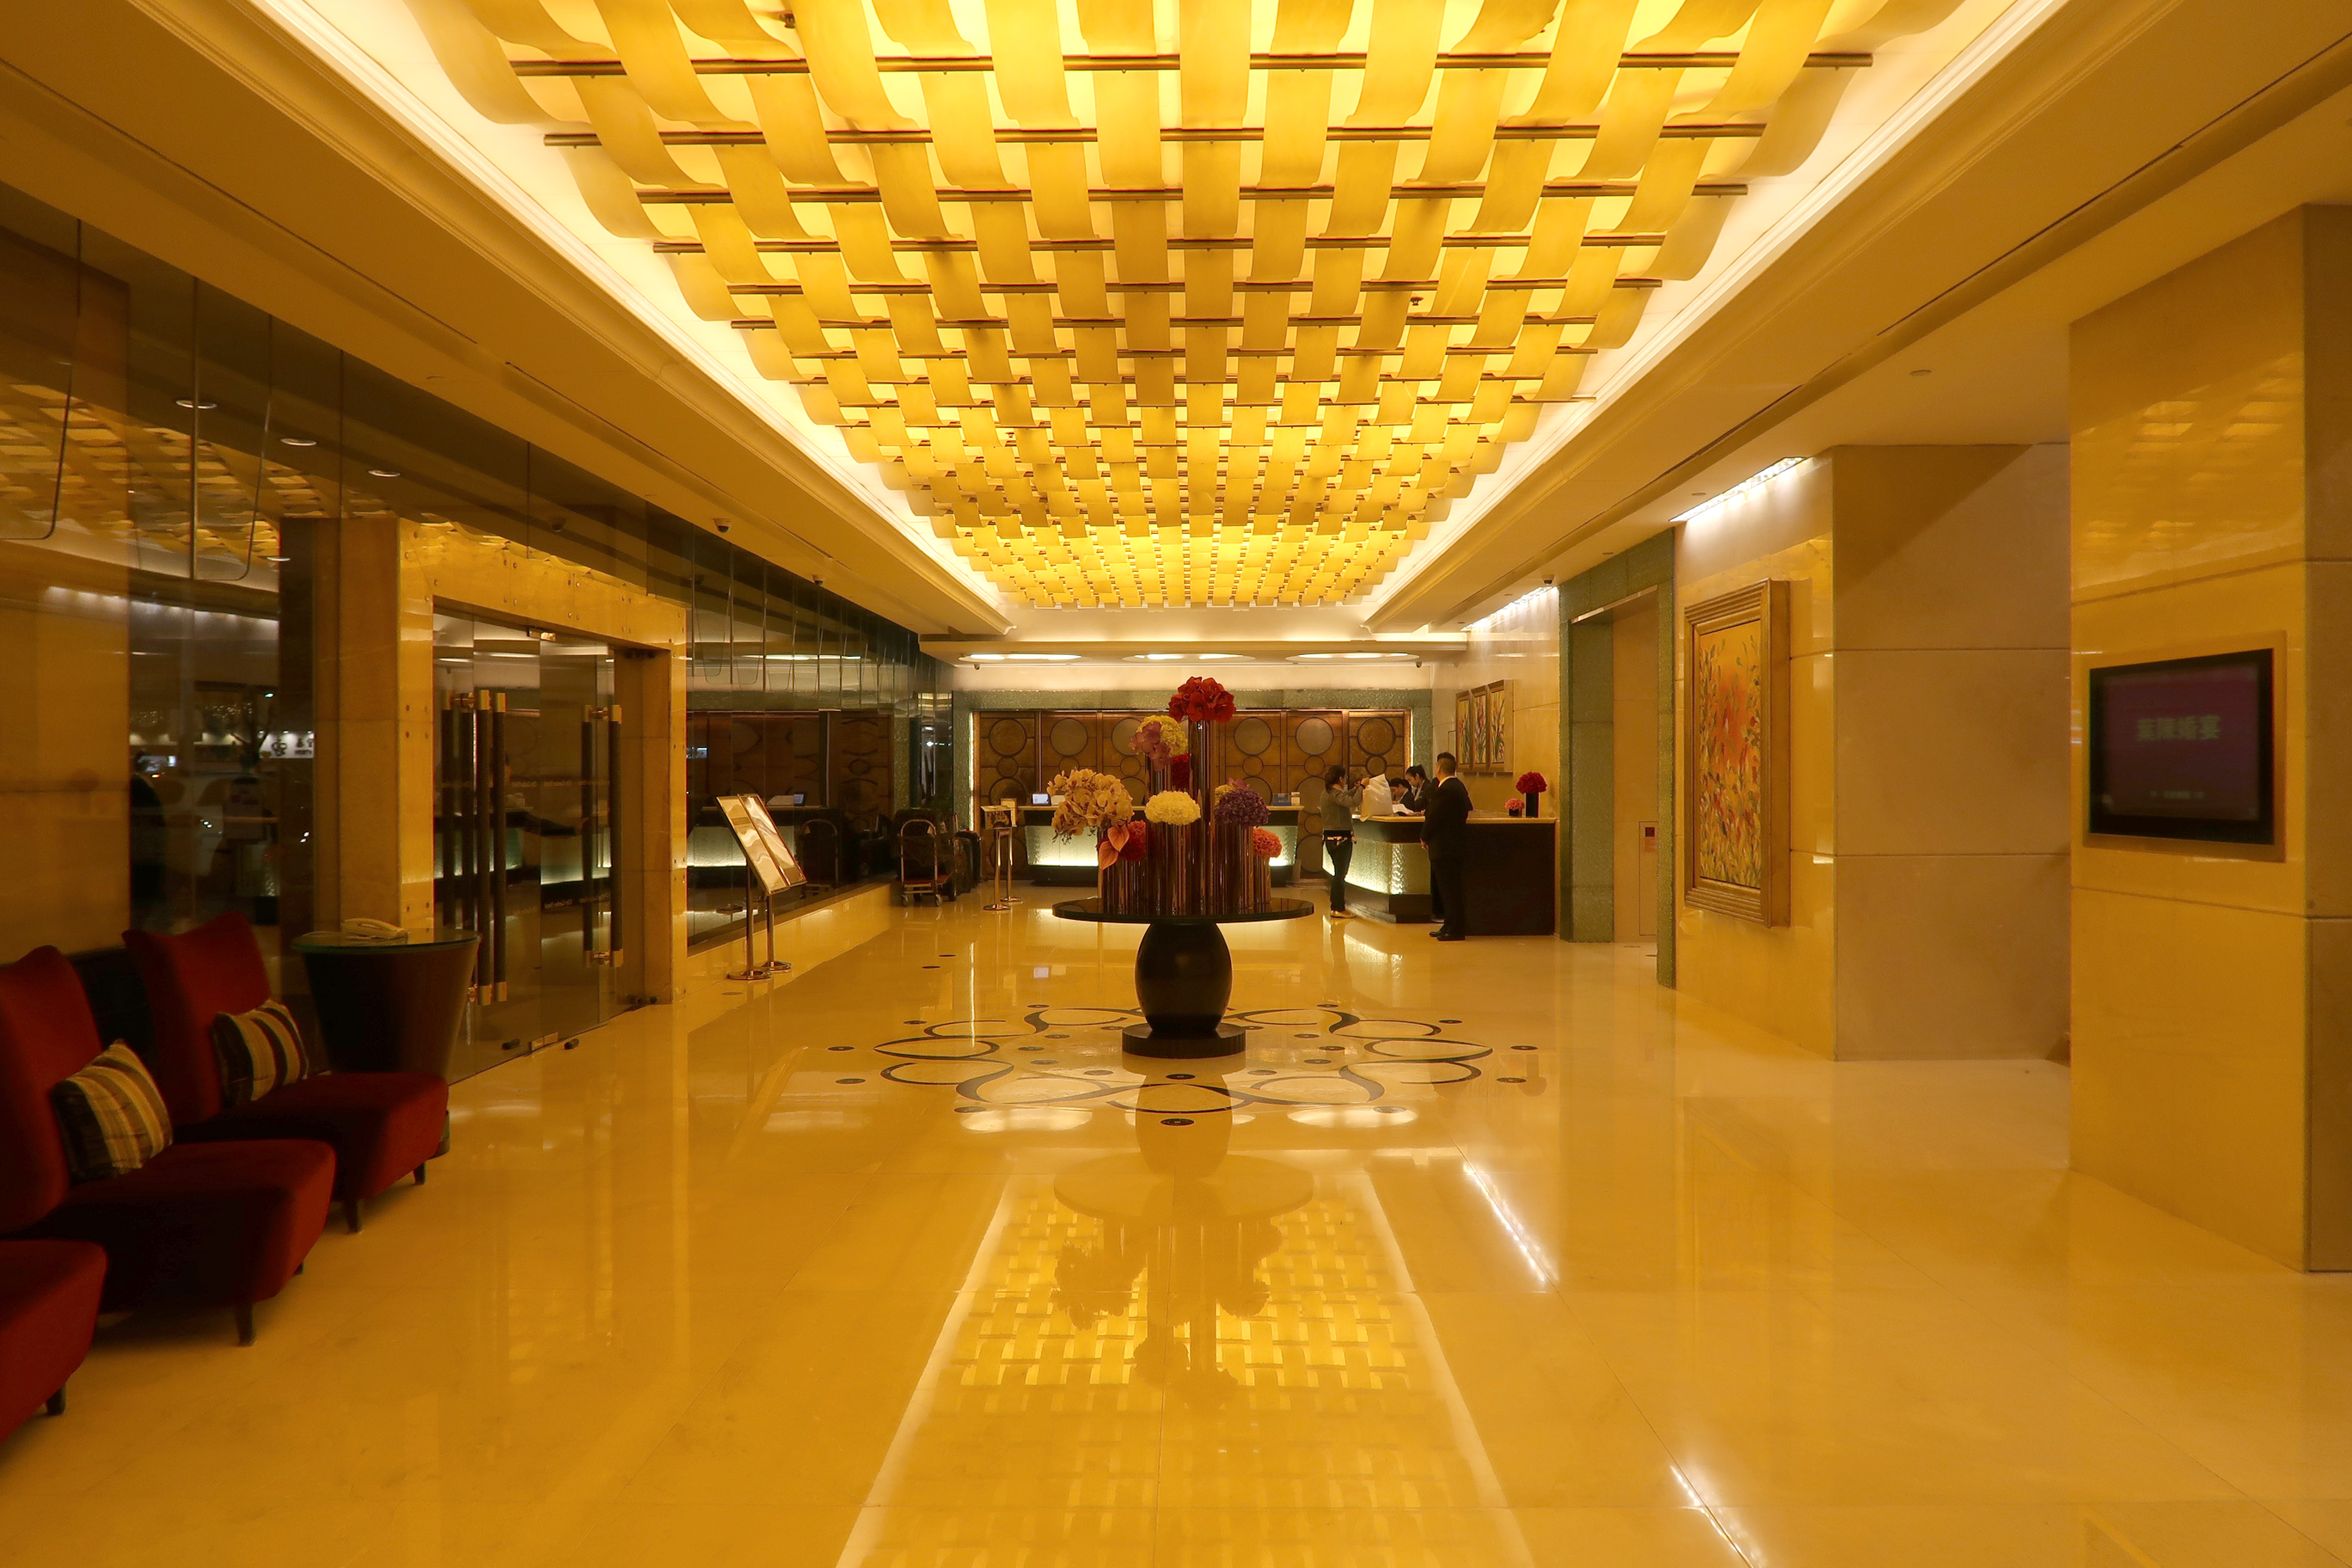 File:City Garden Hotel lobby 2018.jpg - Wikimedia Commons